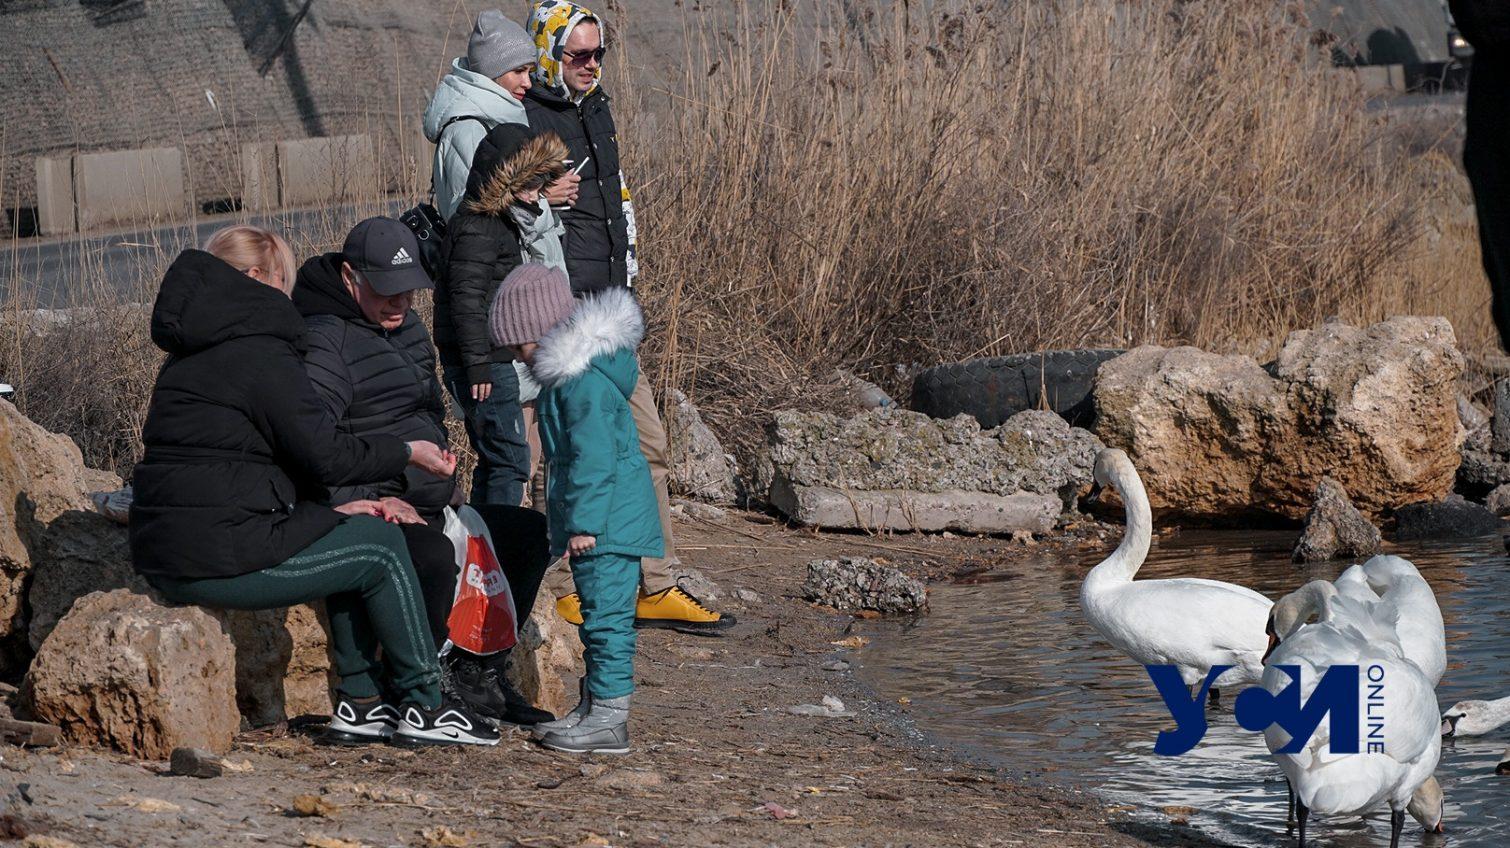 Десятки лебедей и уток: ажиотаж на переправе у Черноморска (фото) «фото»